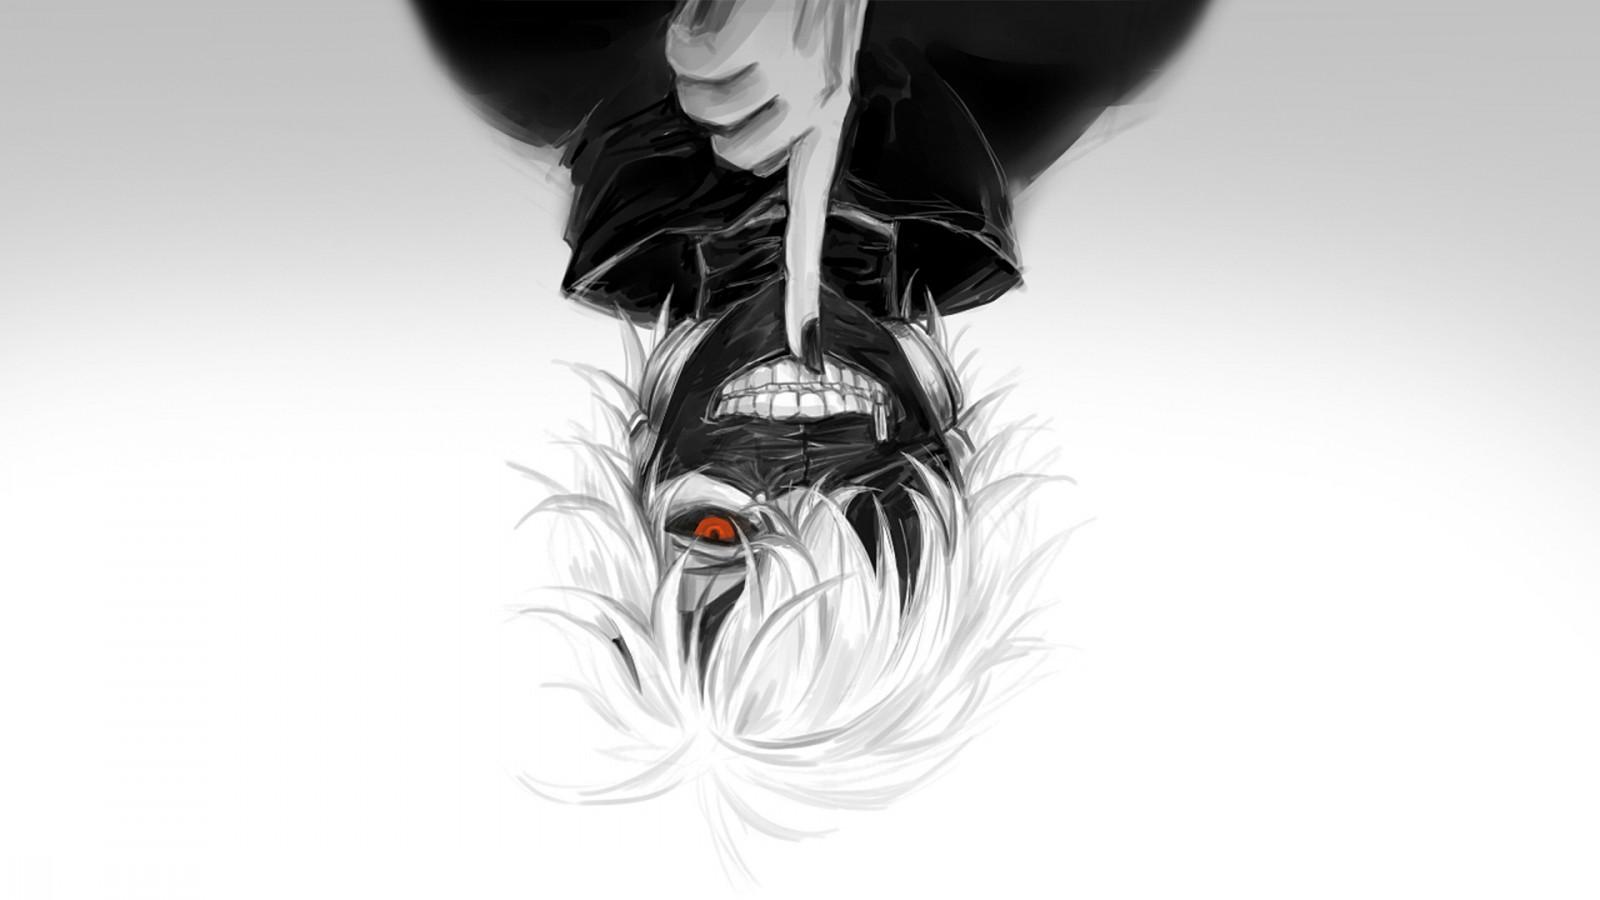 Wallpaper Gambar Ilustrasi Anak Laki Laki Anime